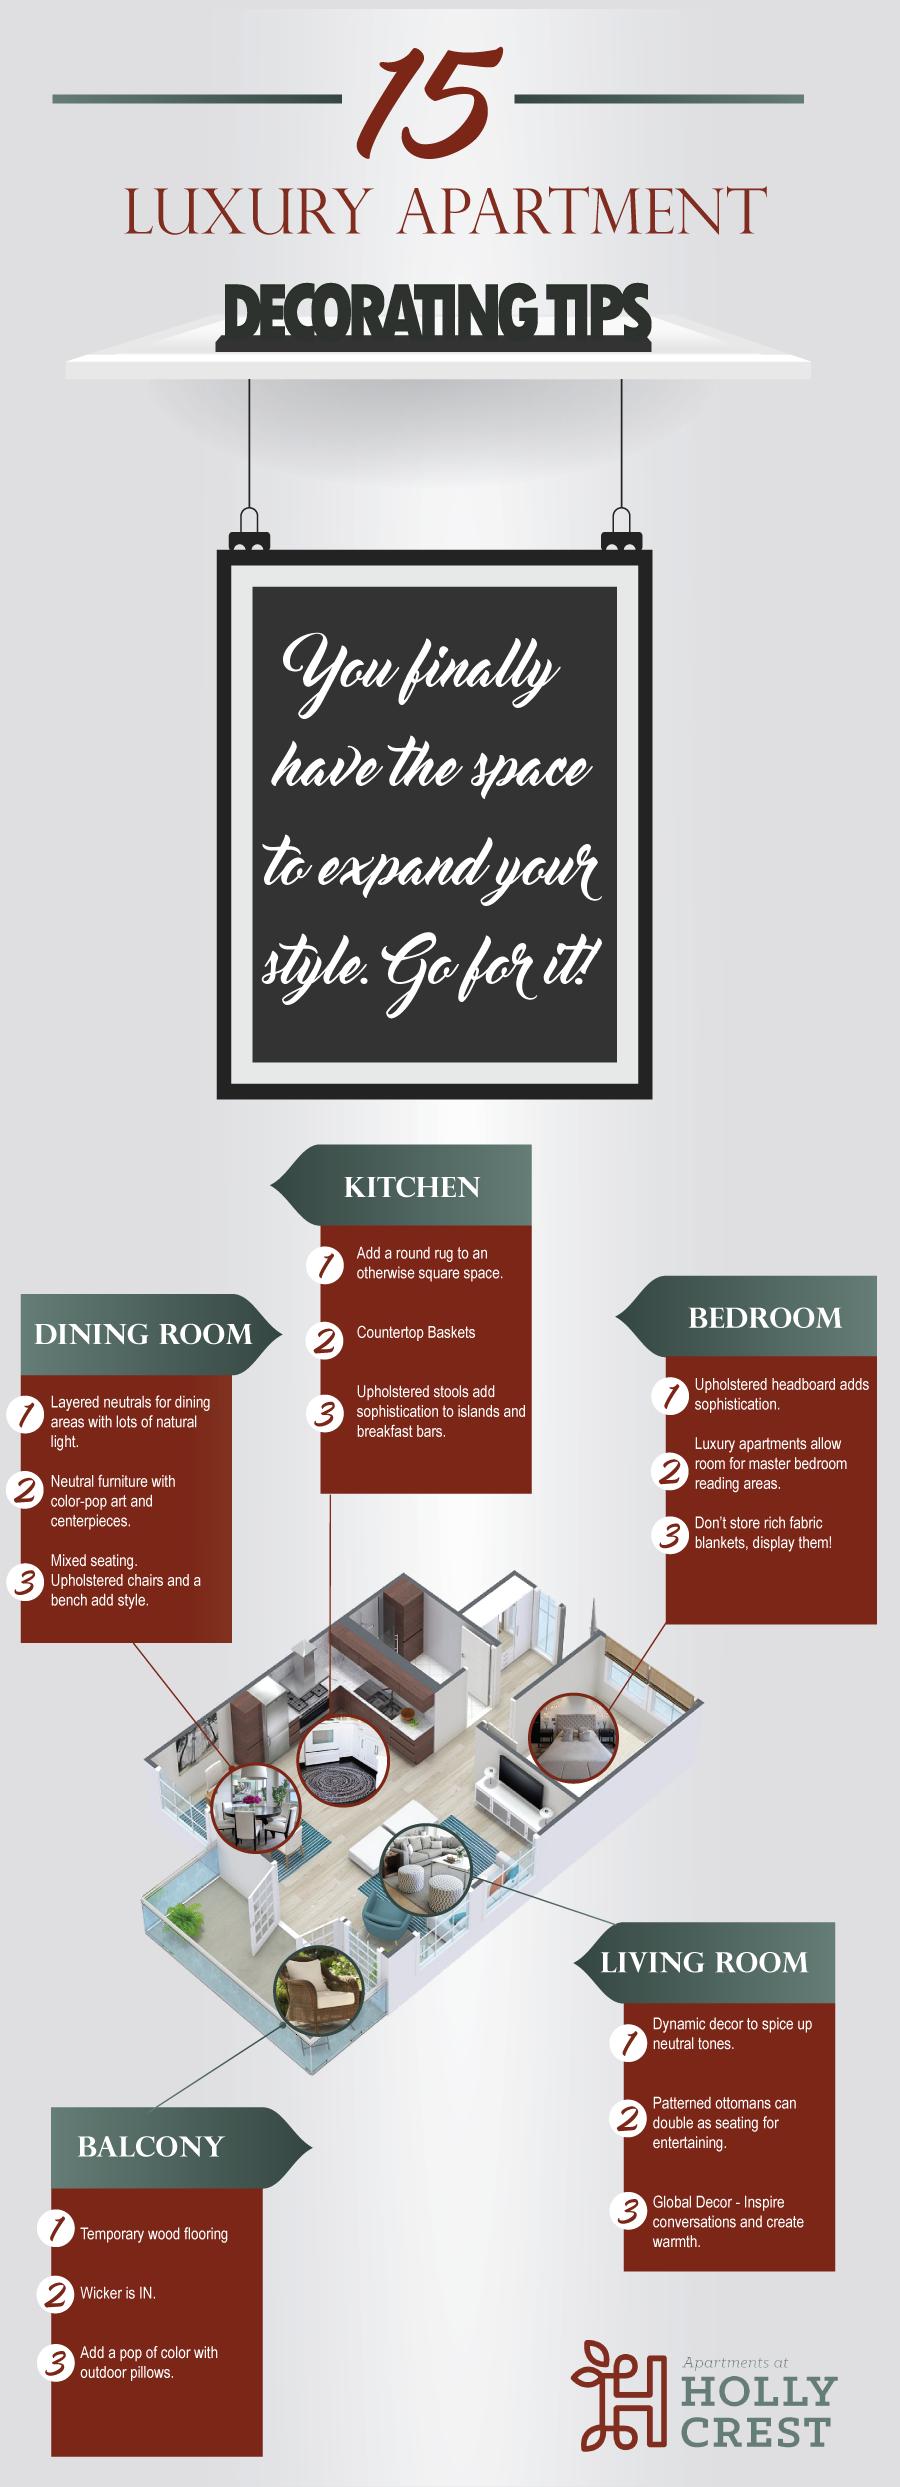 15 Luxury Interior Decorating Tips